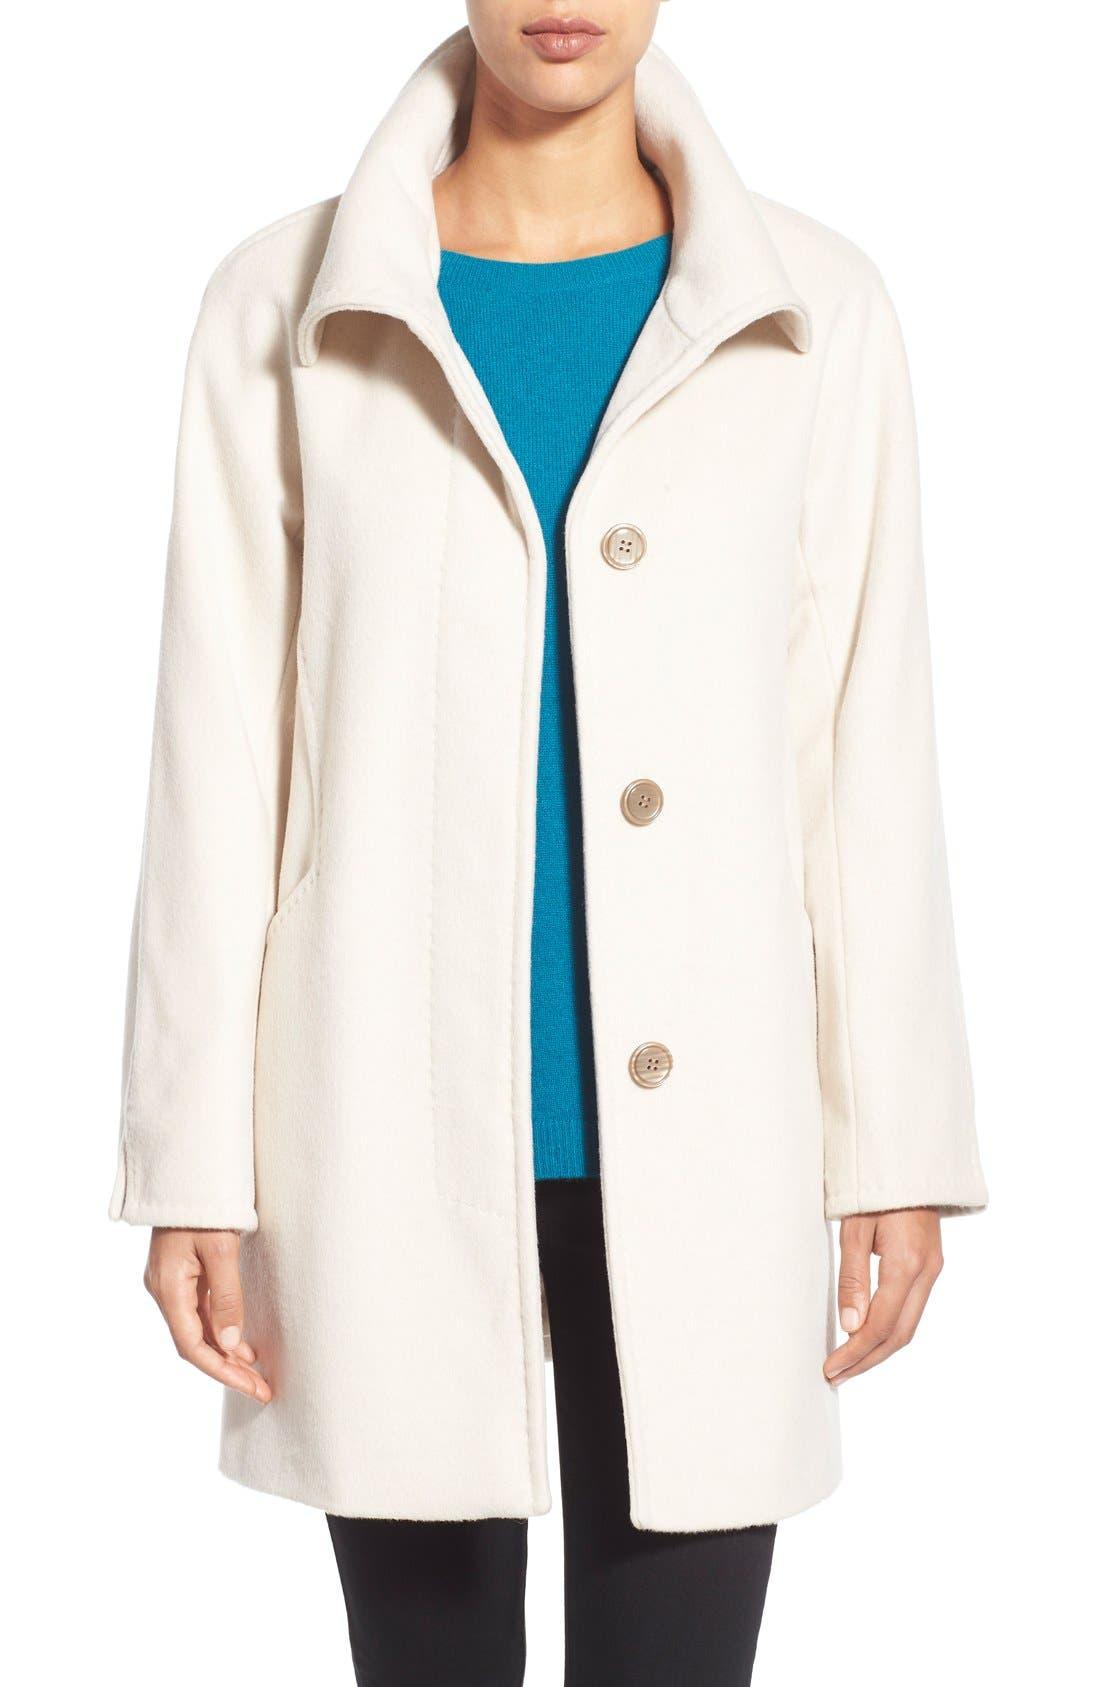 Alternate Image 1 Selected - Ellen Tracy Convertible Collar Kimono Sleeve Coat (Regular & Petite) (Nordstrom Exclusive)